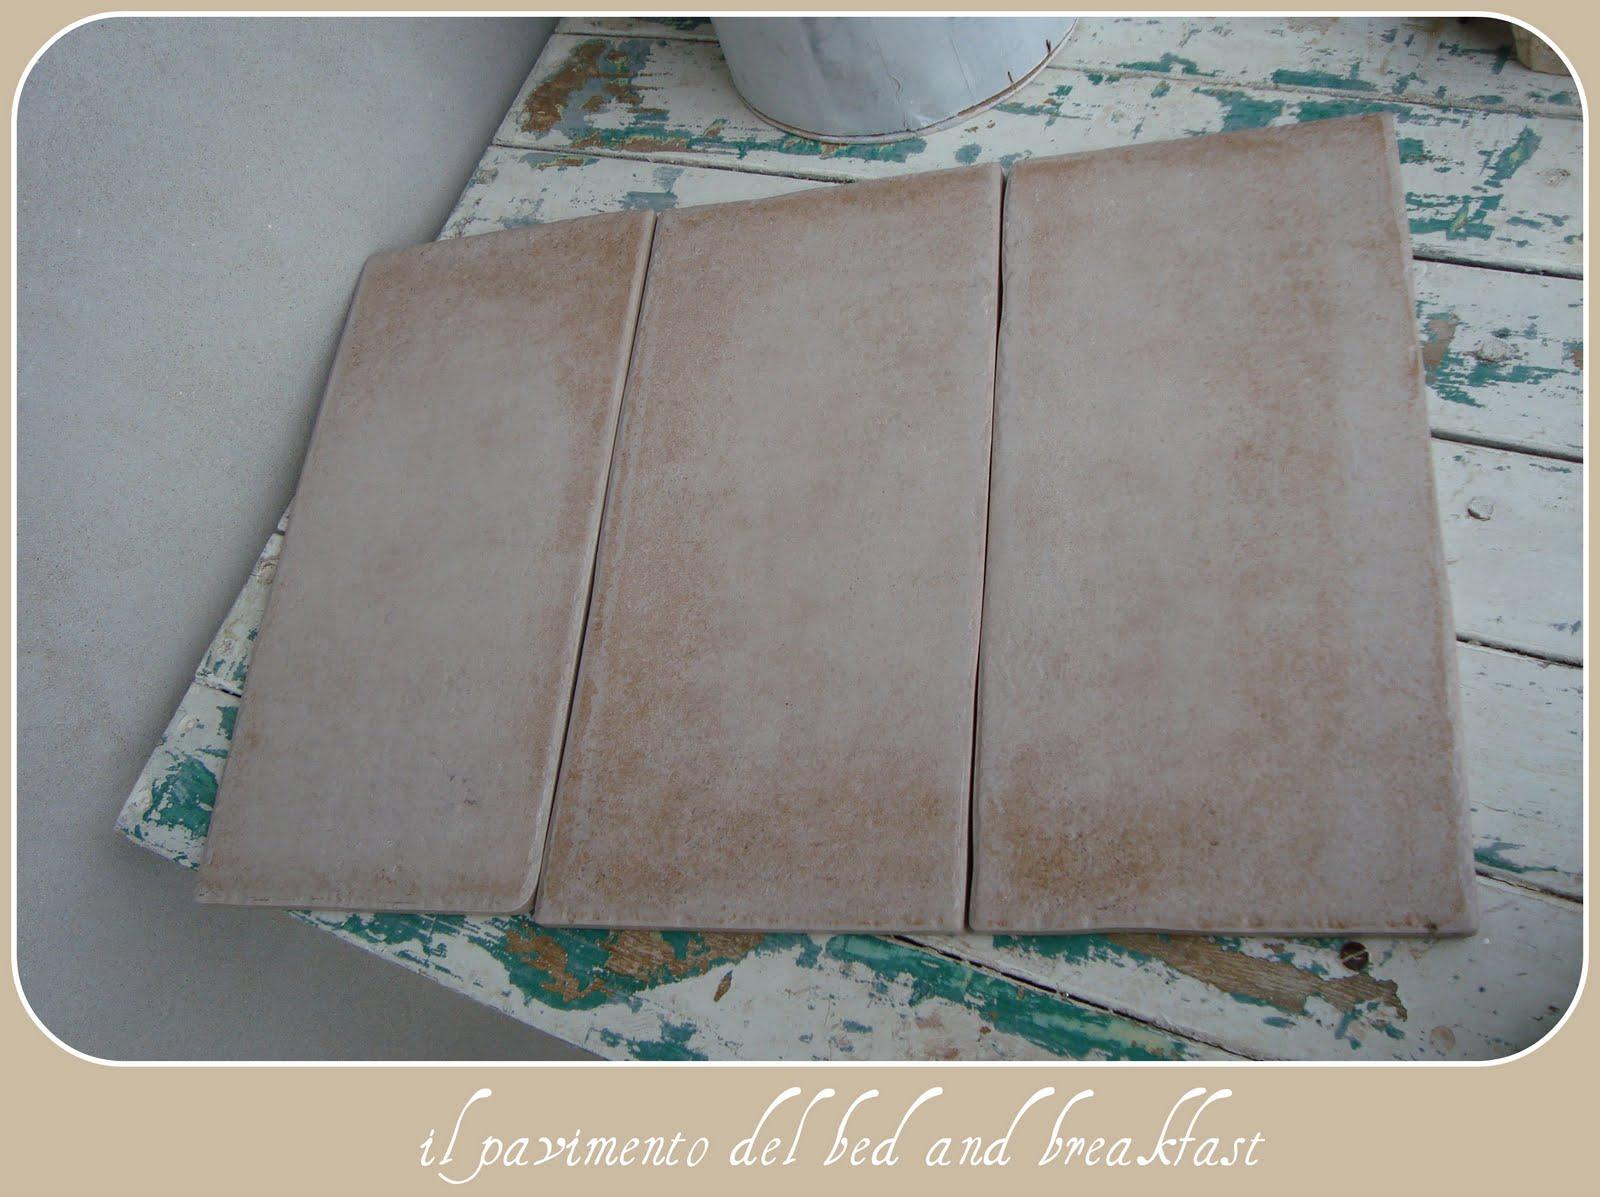 Piastrelle 10x10 bianche elegant mattonelle x cucina in for Piastrelle cucina 10x10 bianche